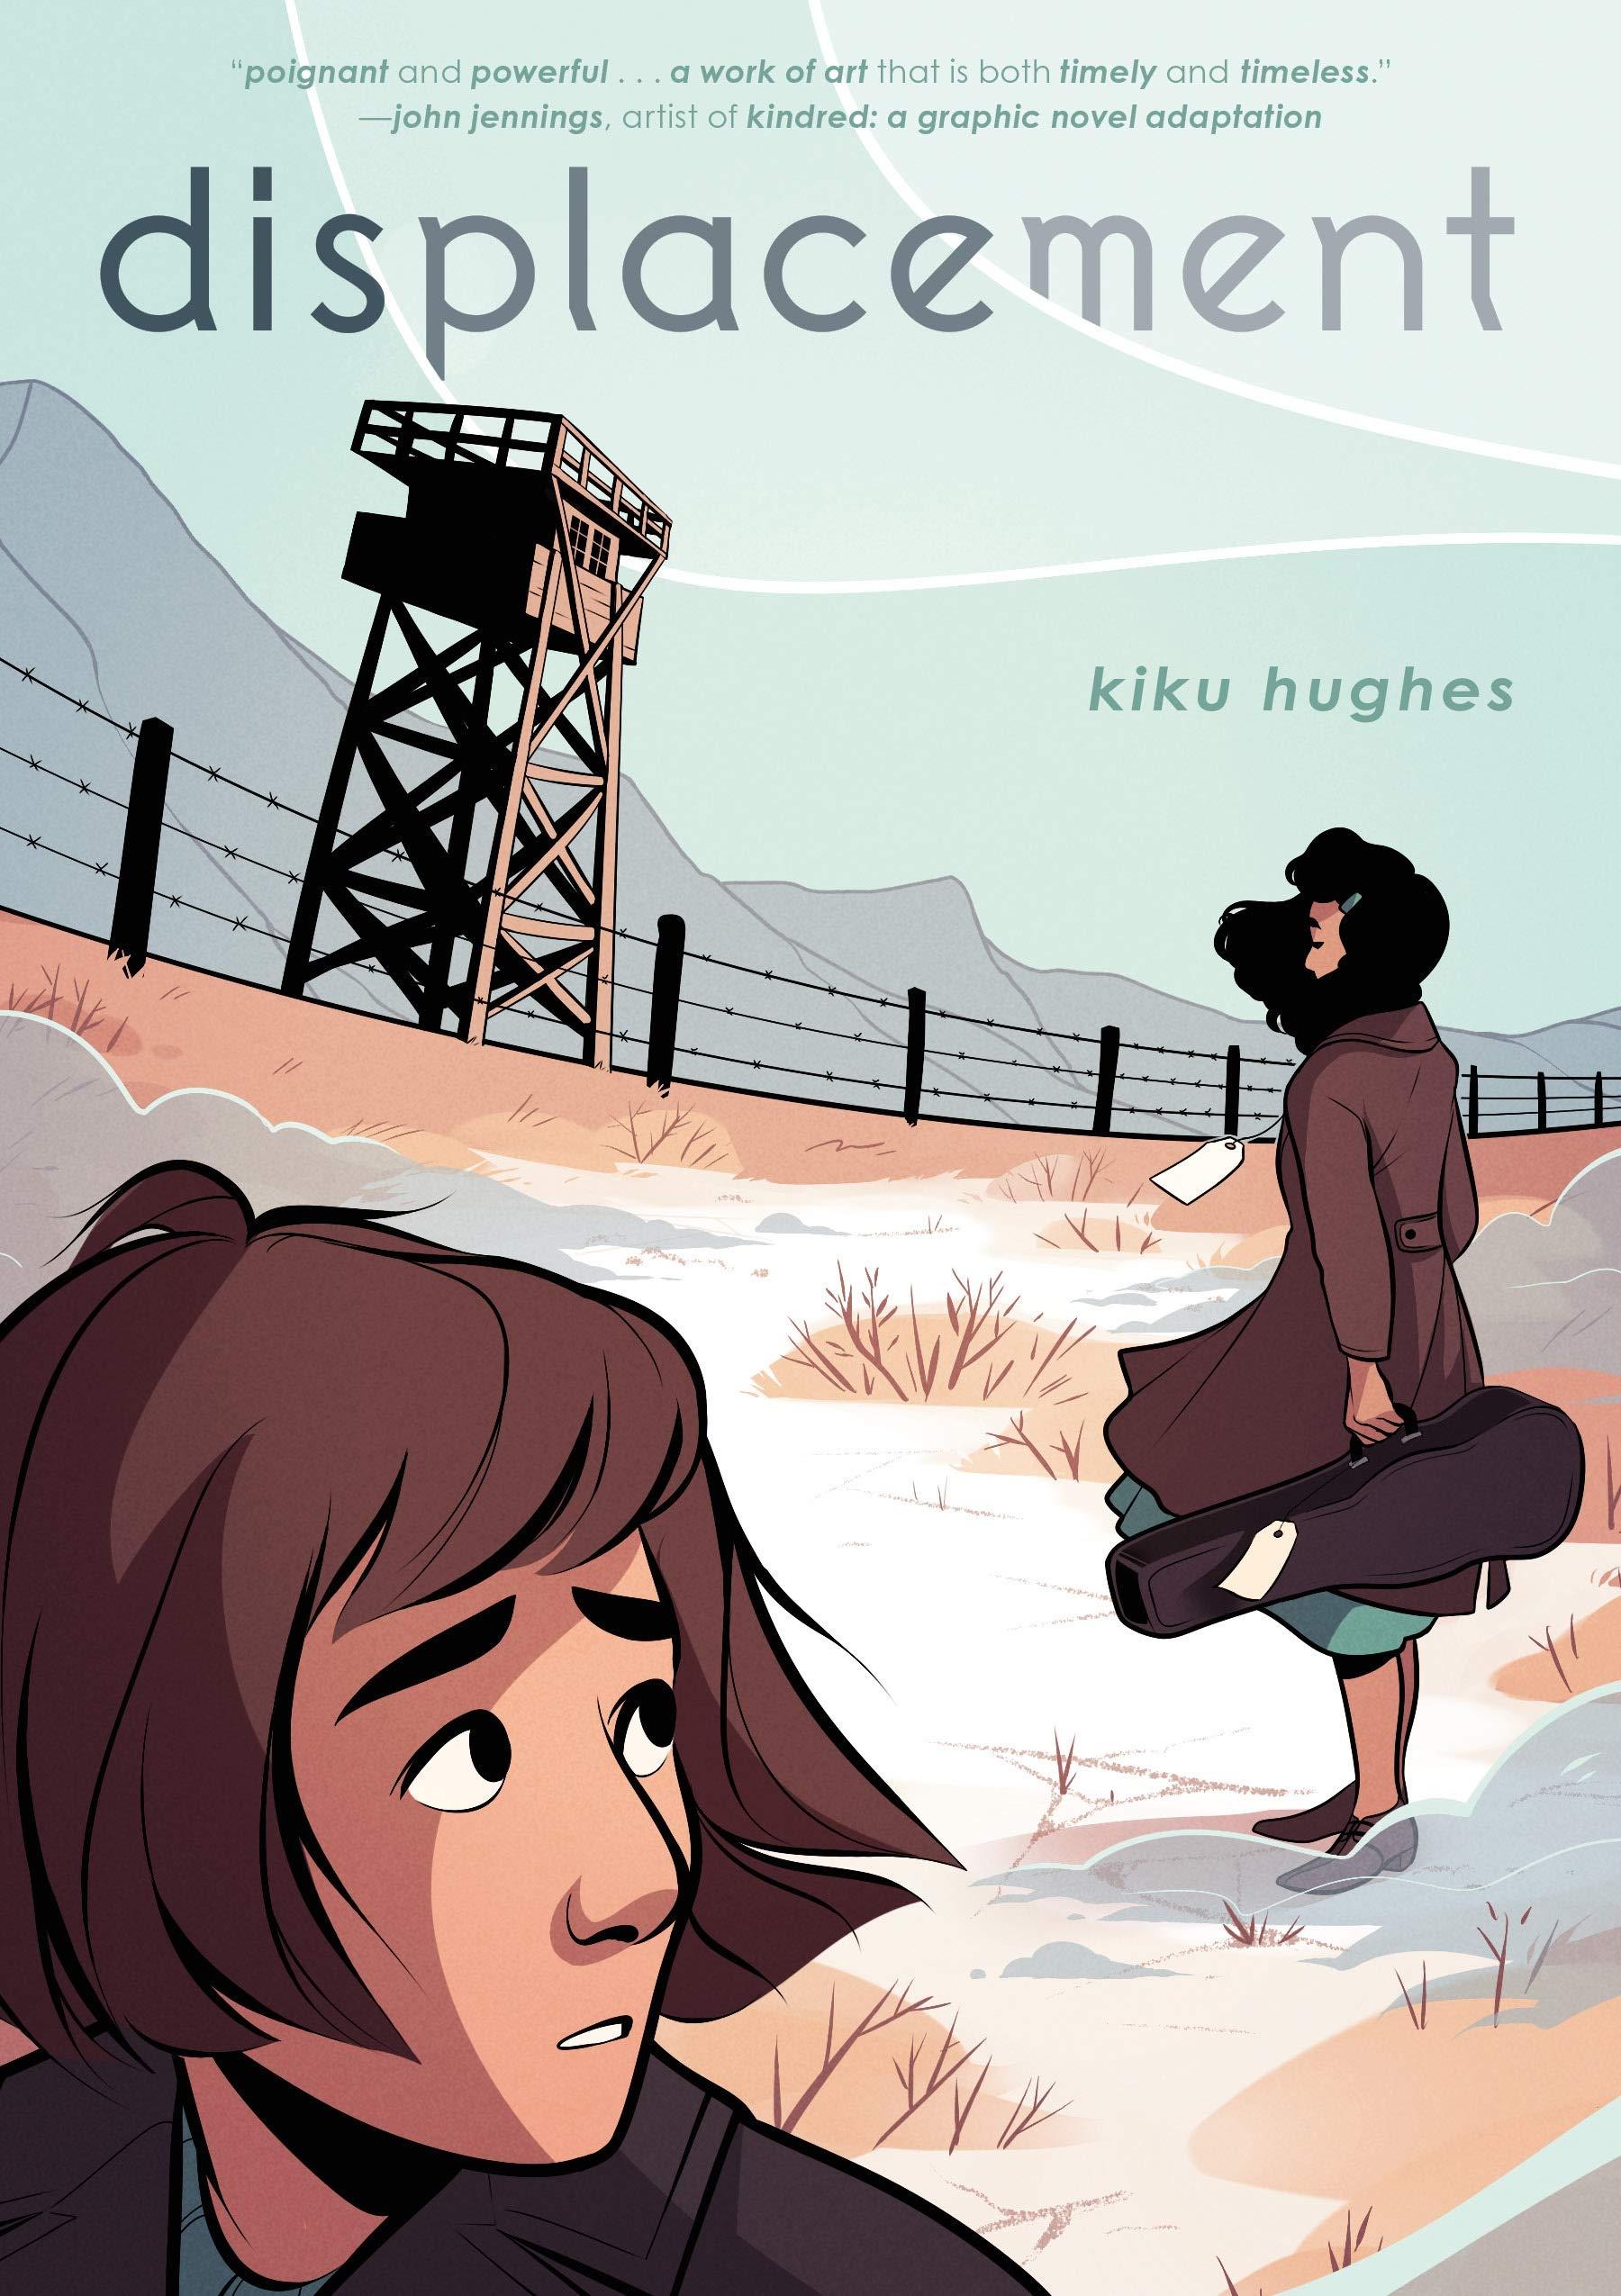 Amazon.com: Displacement (9781250193537): Hughes, Kiku: Books